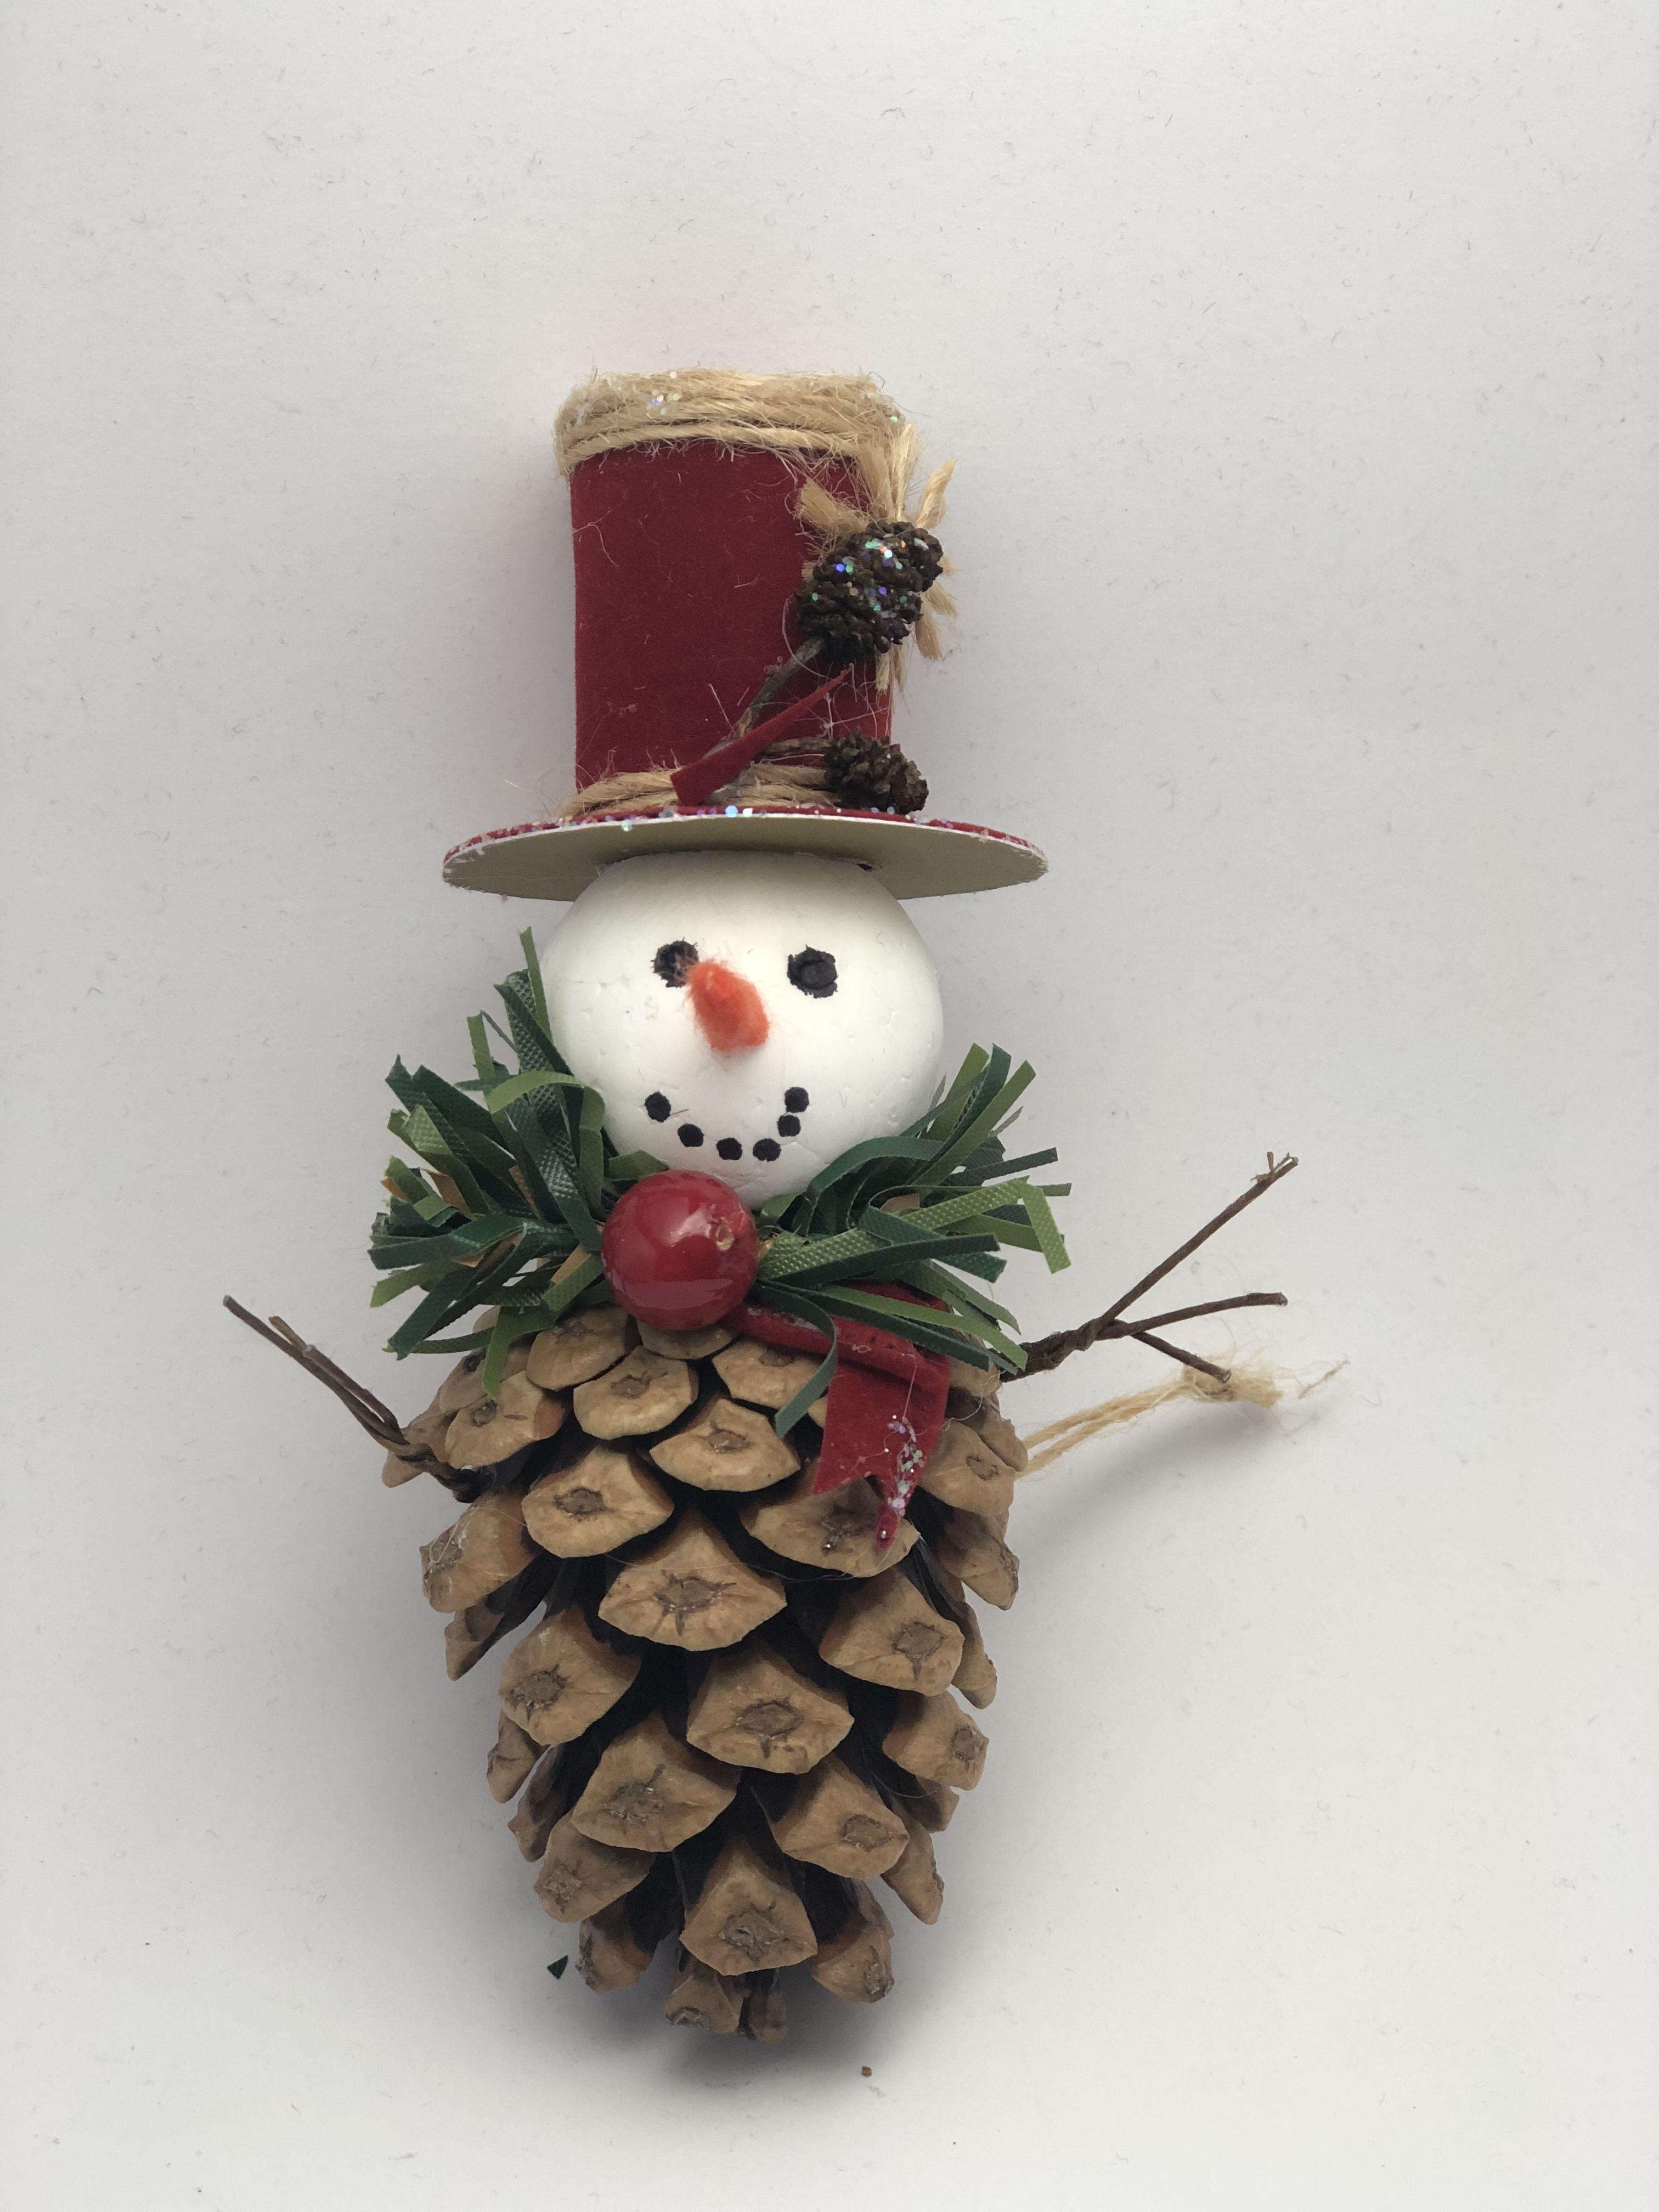 Pinecone Snowman Pine Cone Christmas Decorations Christmas Tree Decorations Diy Christmas Crafts